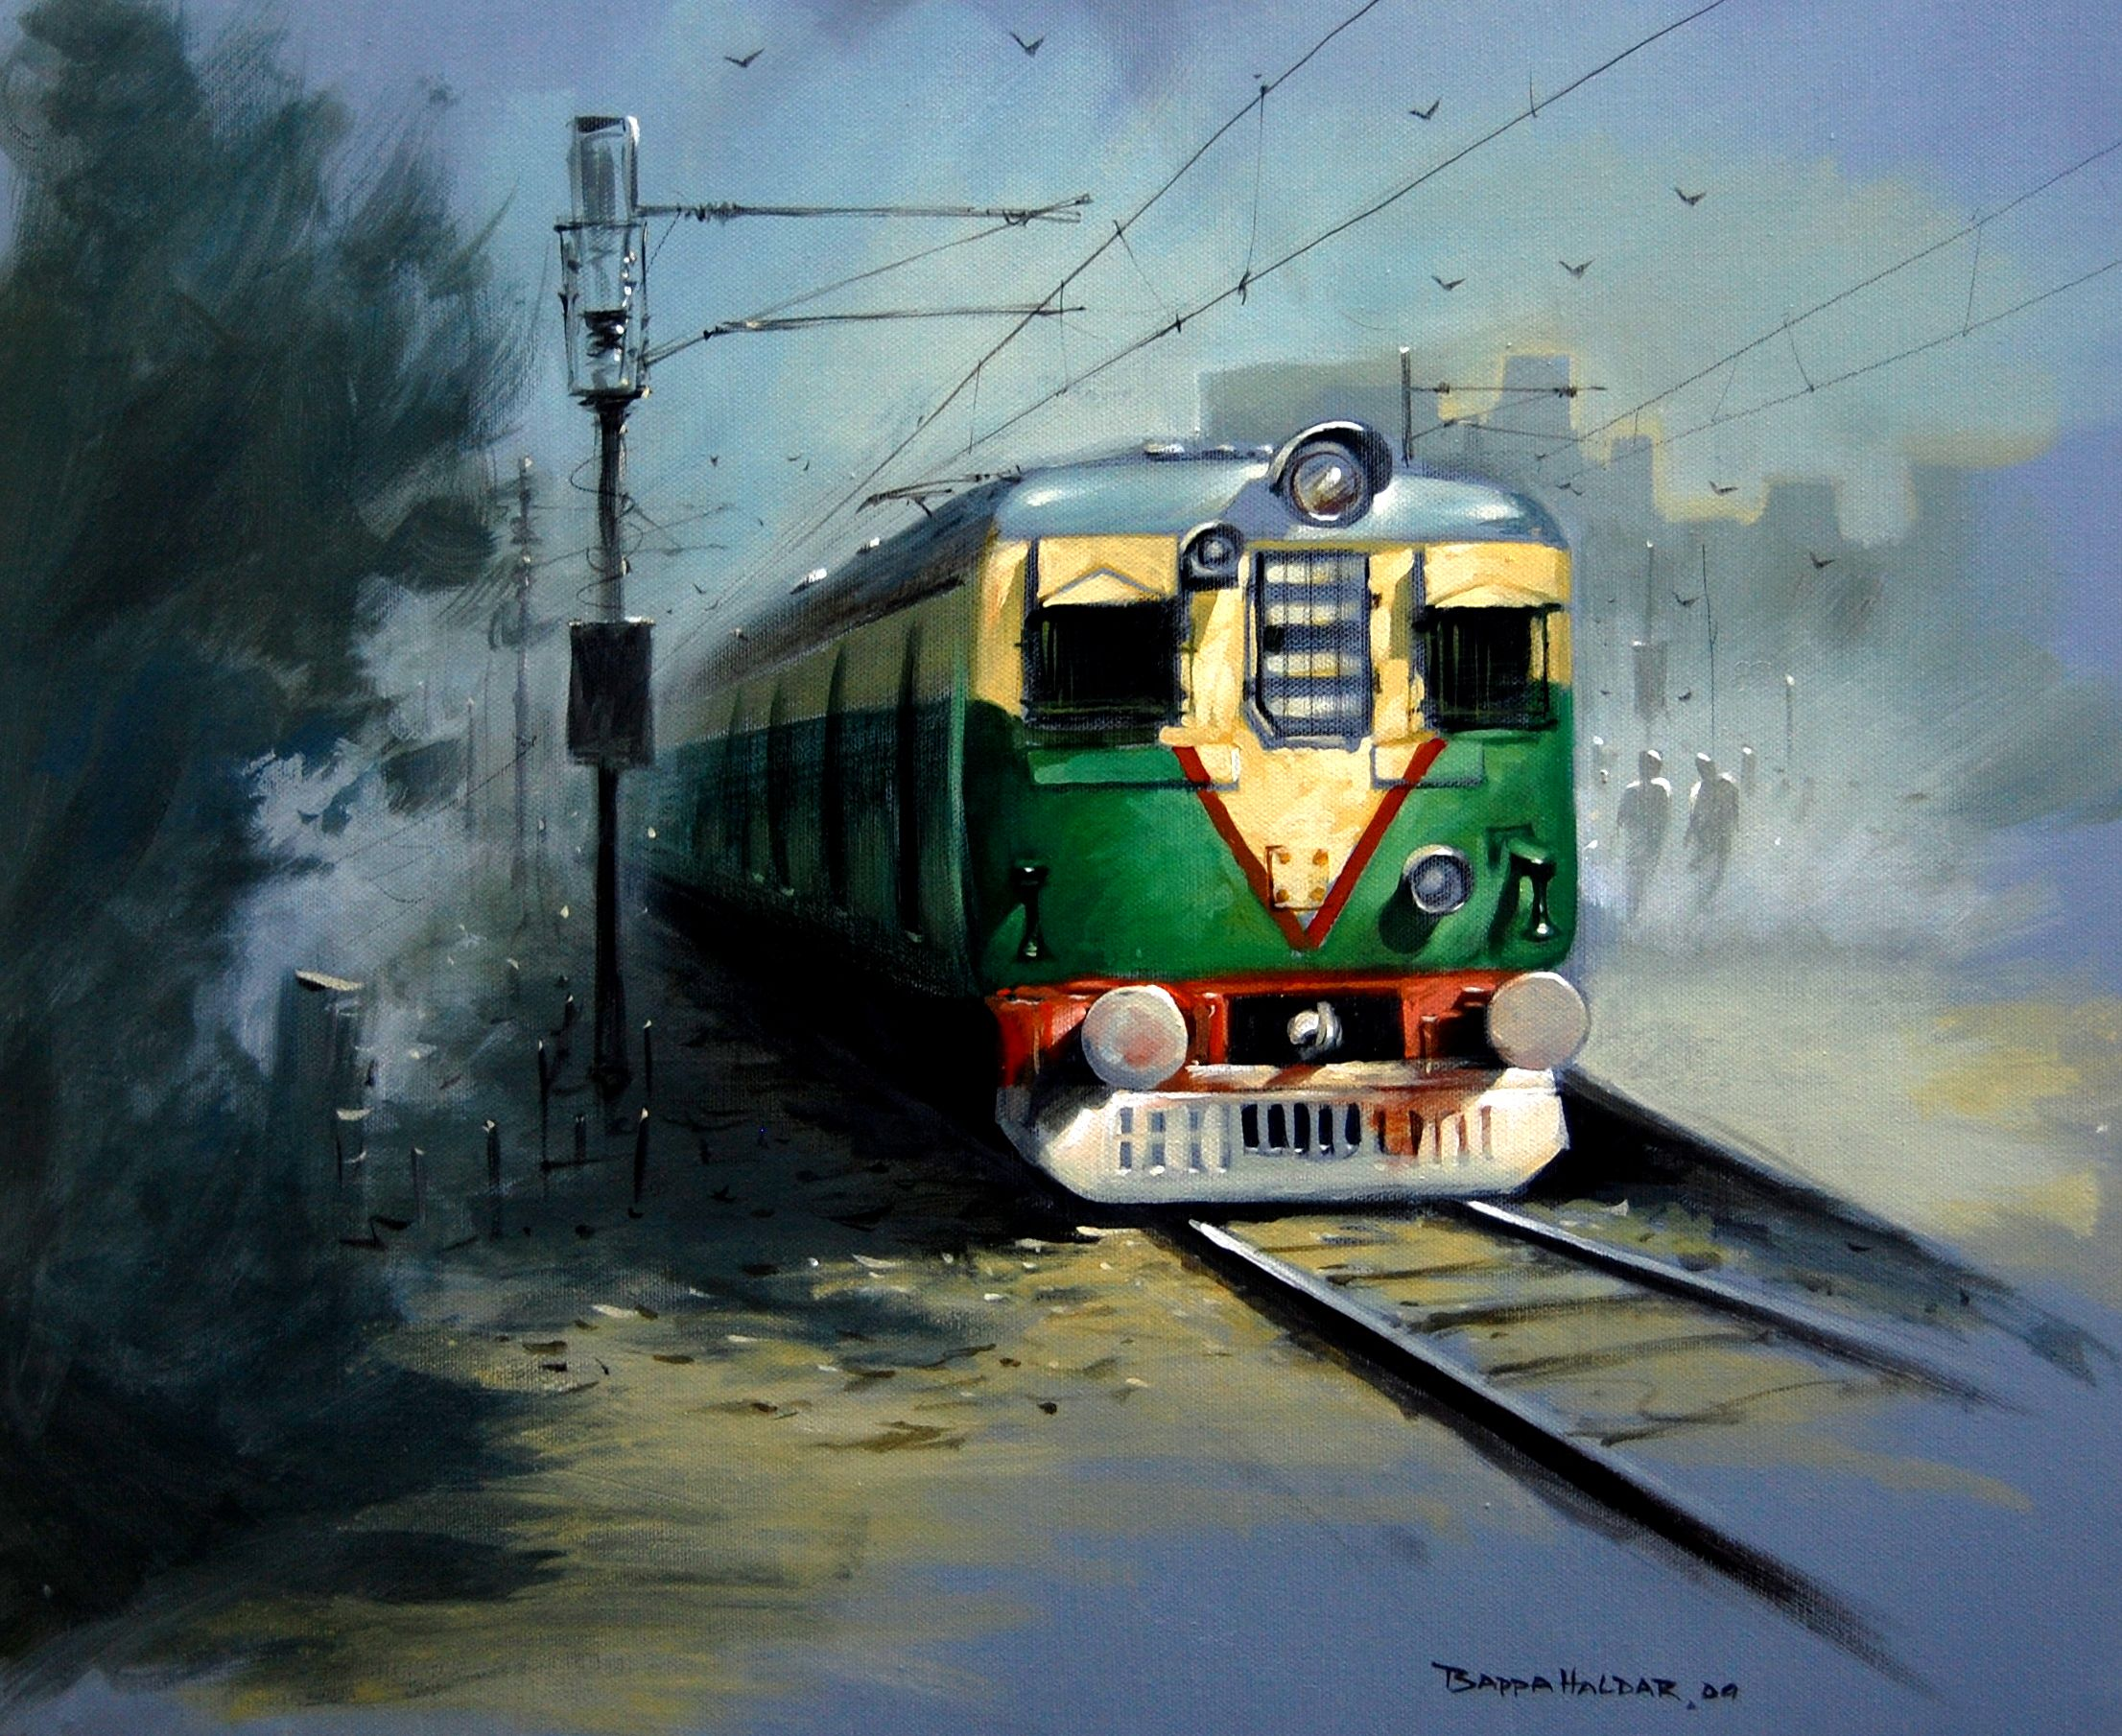 Morning Train - Draw Bappa Haldar 700 Online